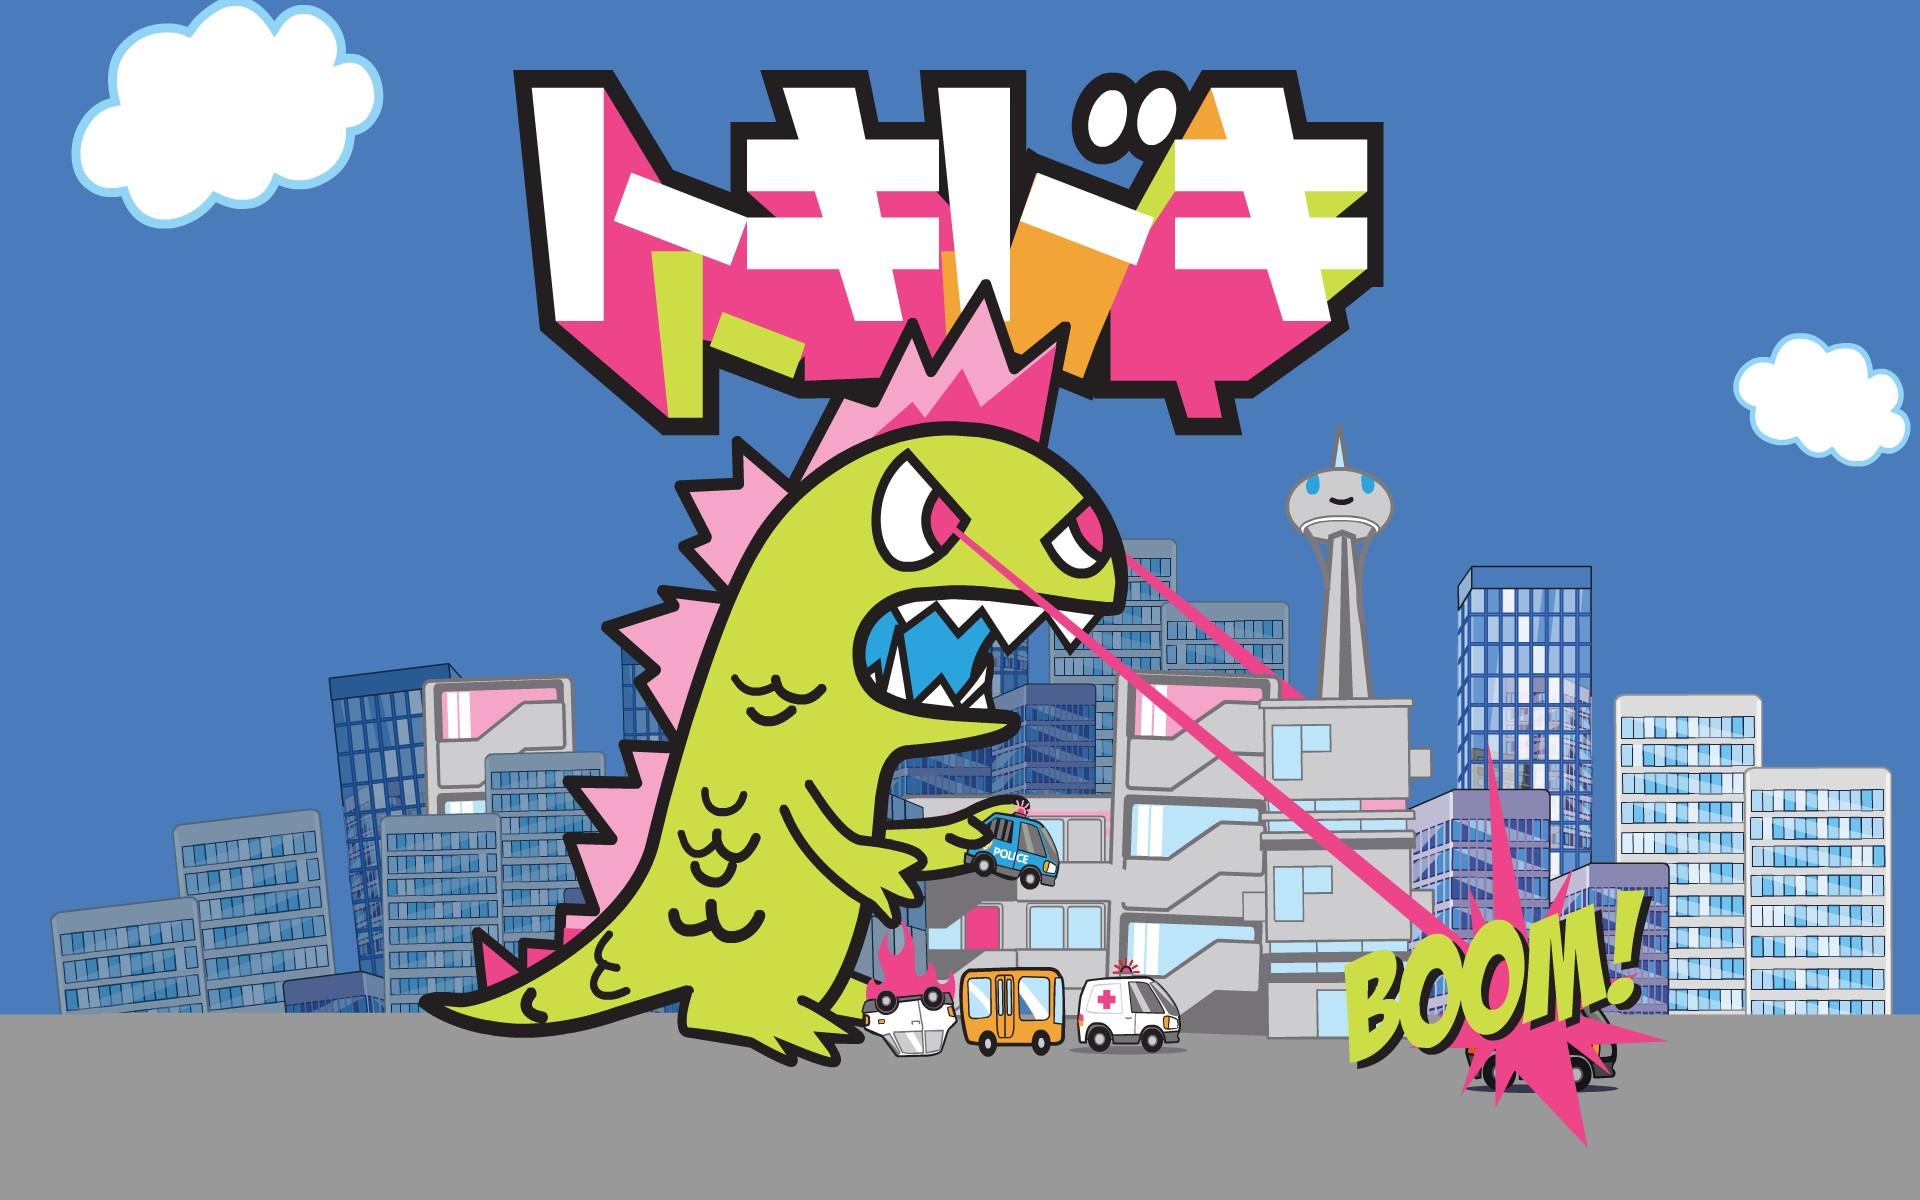 Cute Tokidoki Wallpaper Tokidoki Hd Wallpaper Background Image 1920x1200 Id